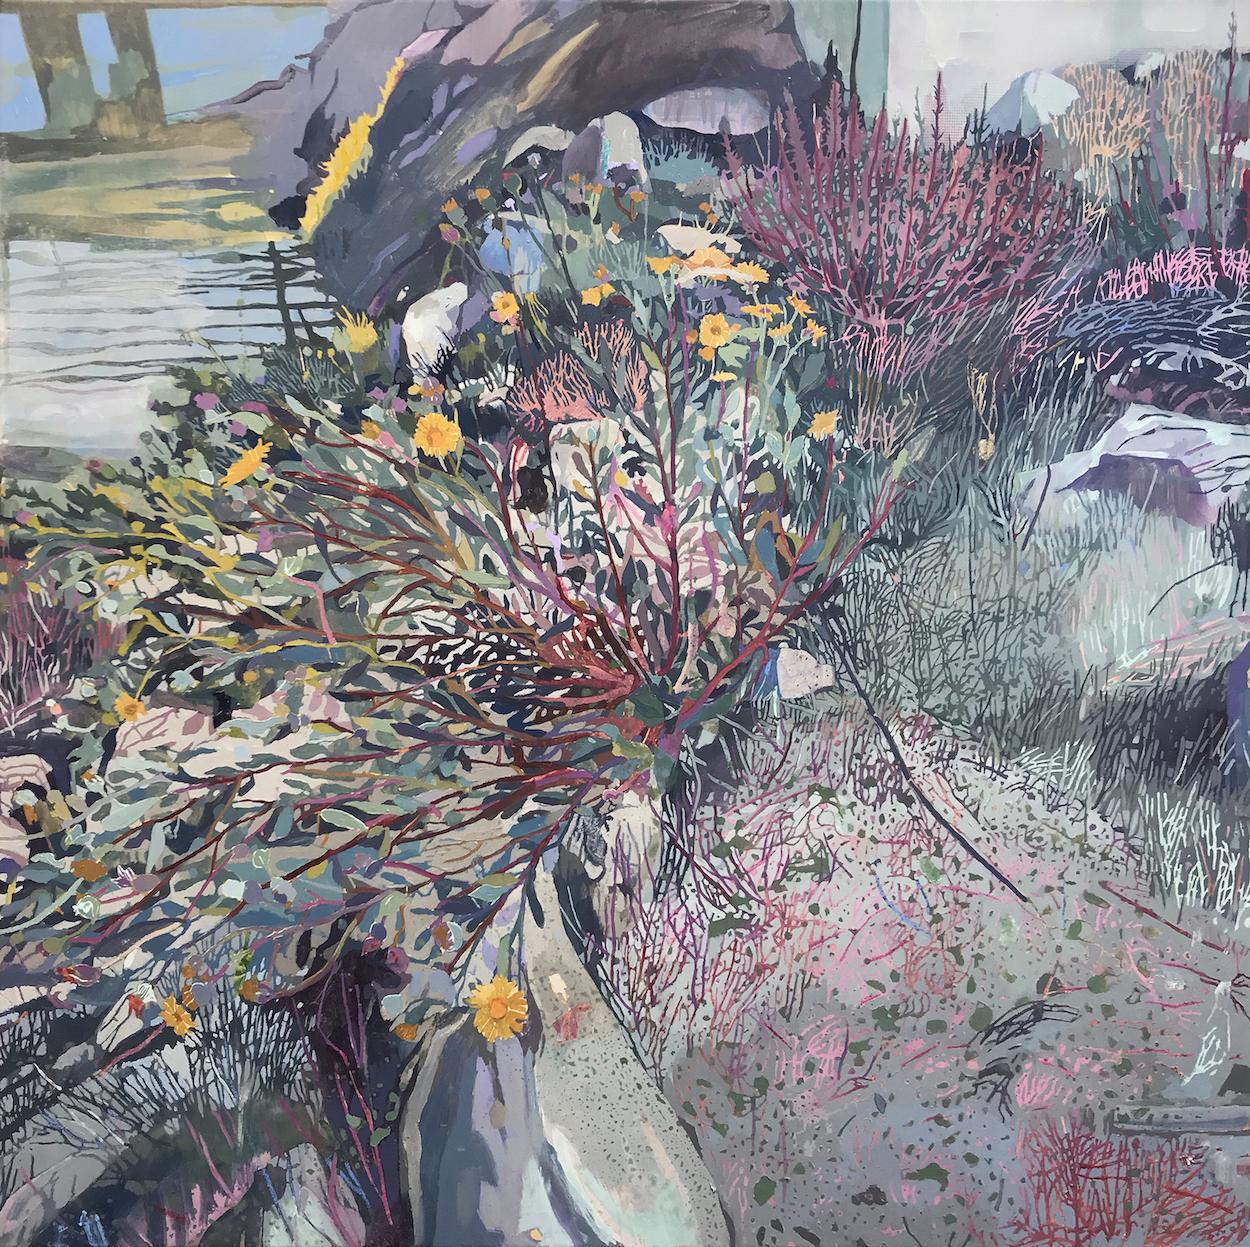 Marina. Fox and Cubs. Conrad Clarke. Jackson's Painting Prize.